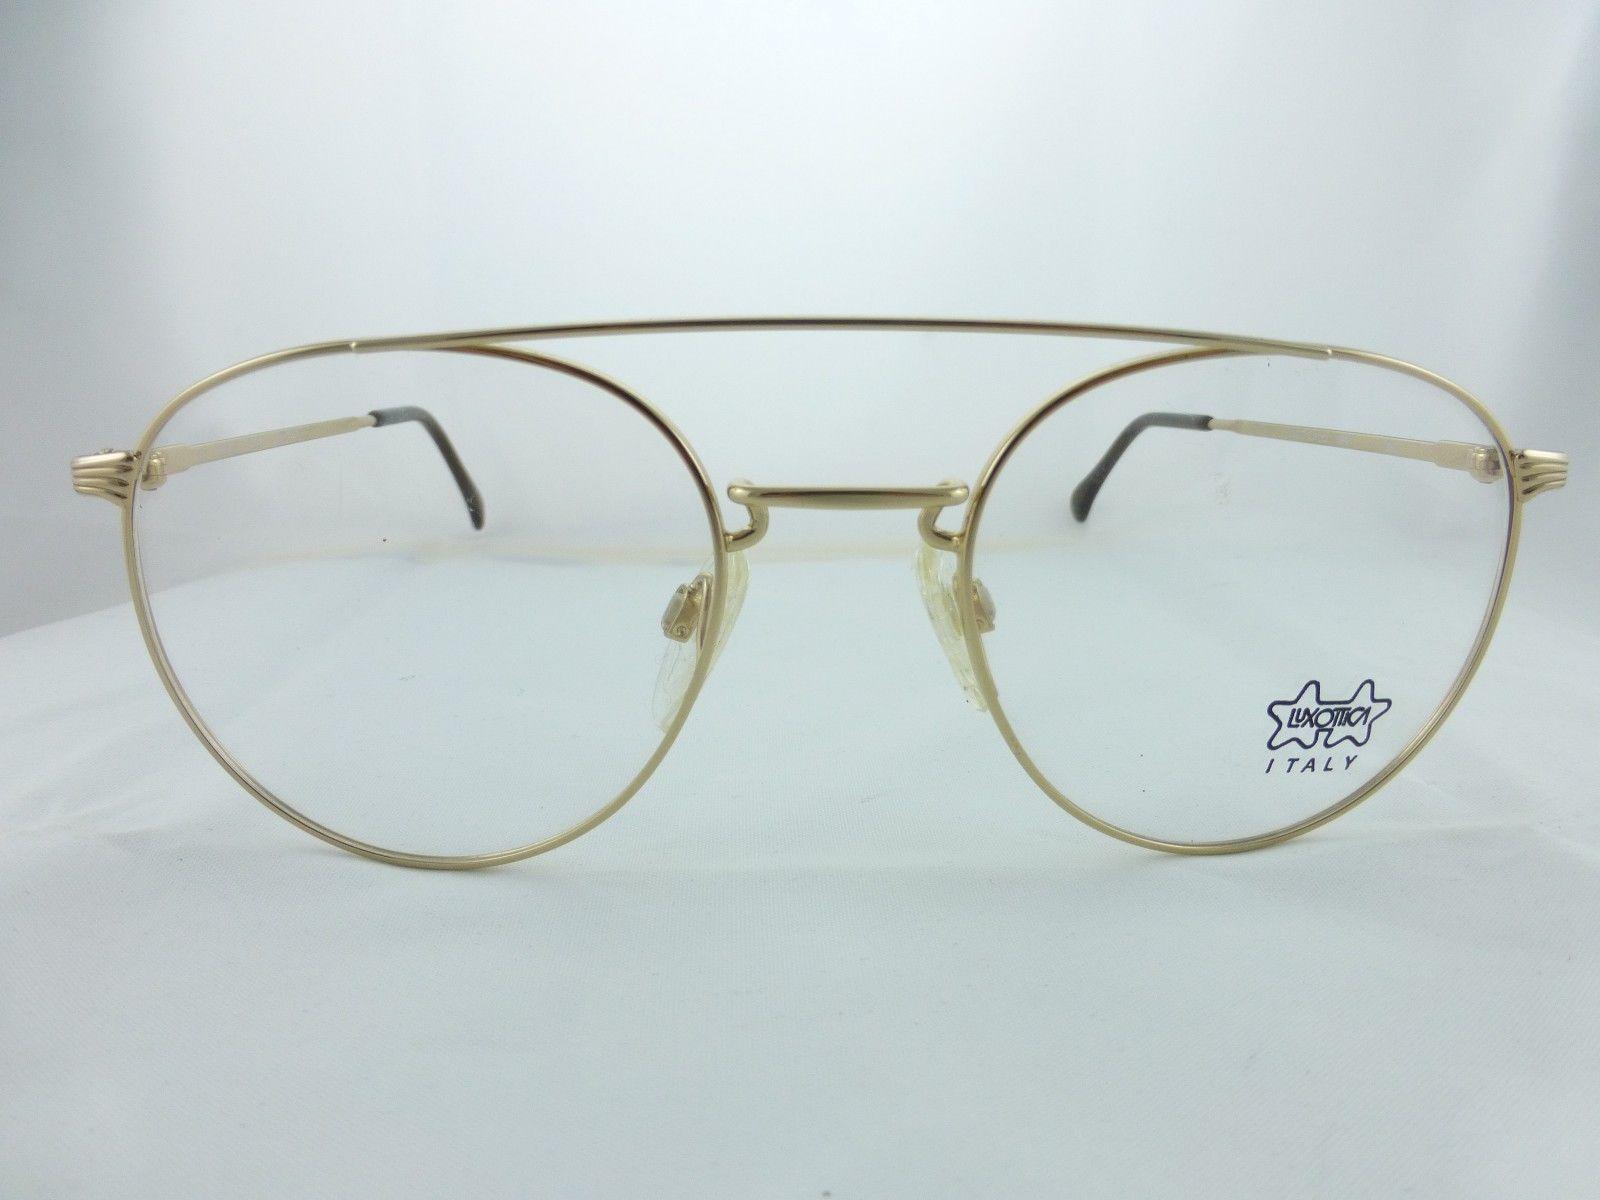 luxottica eyeglasses frame special shape gold